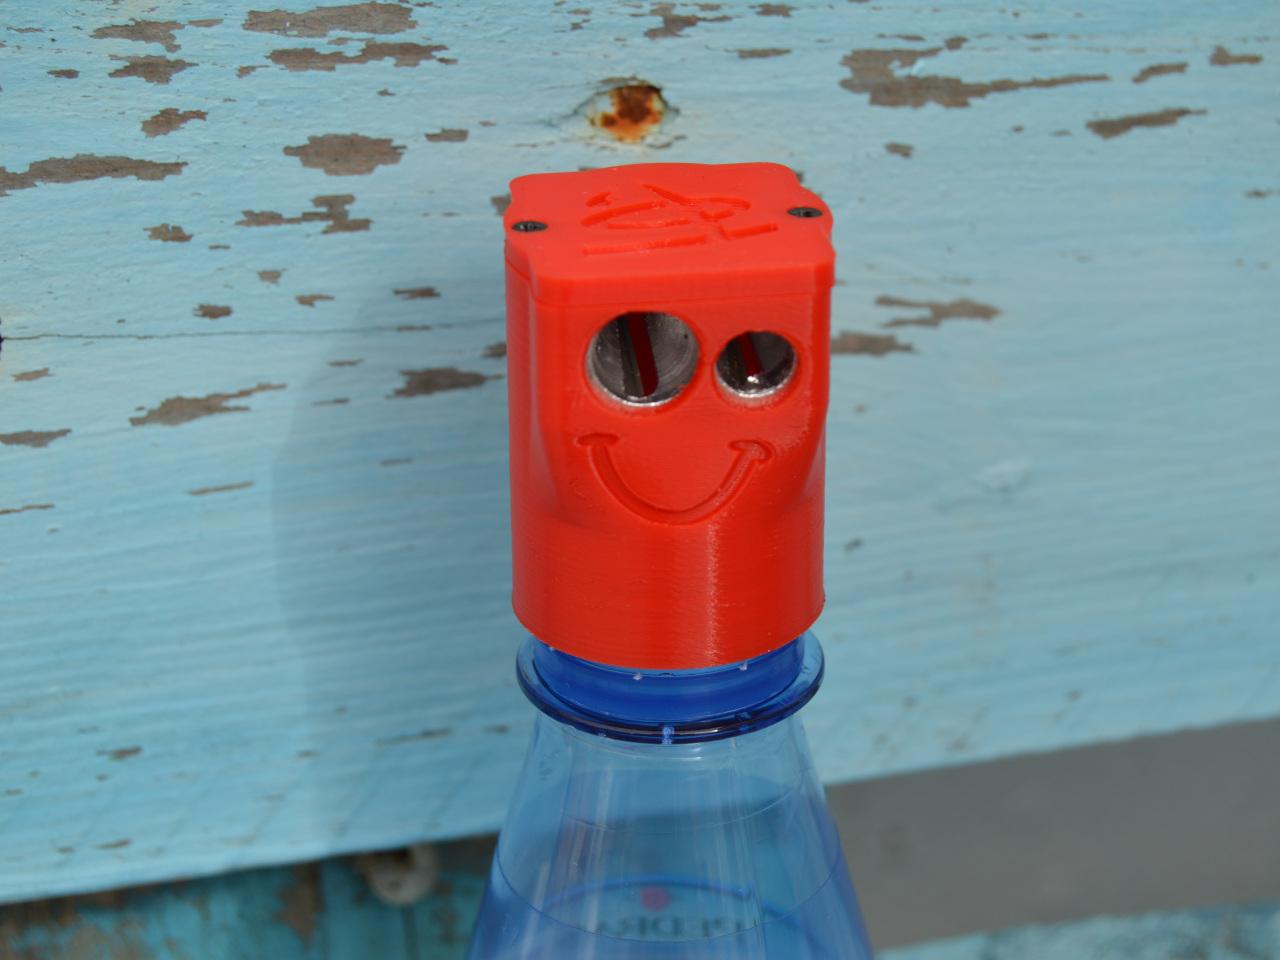 Bottle-pencil-sharpener-container-5.jpg Download free STL file Bottle pencil sharpener (container) • 3D printer model, topedesigns